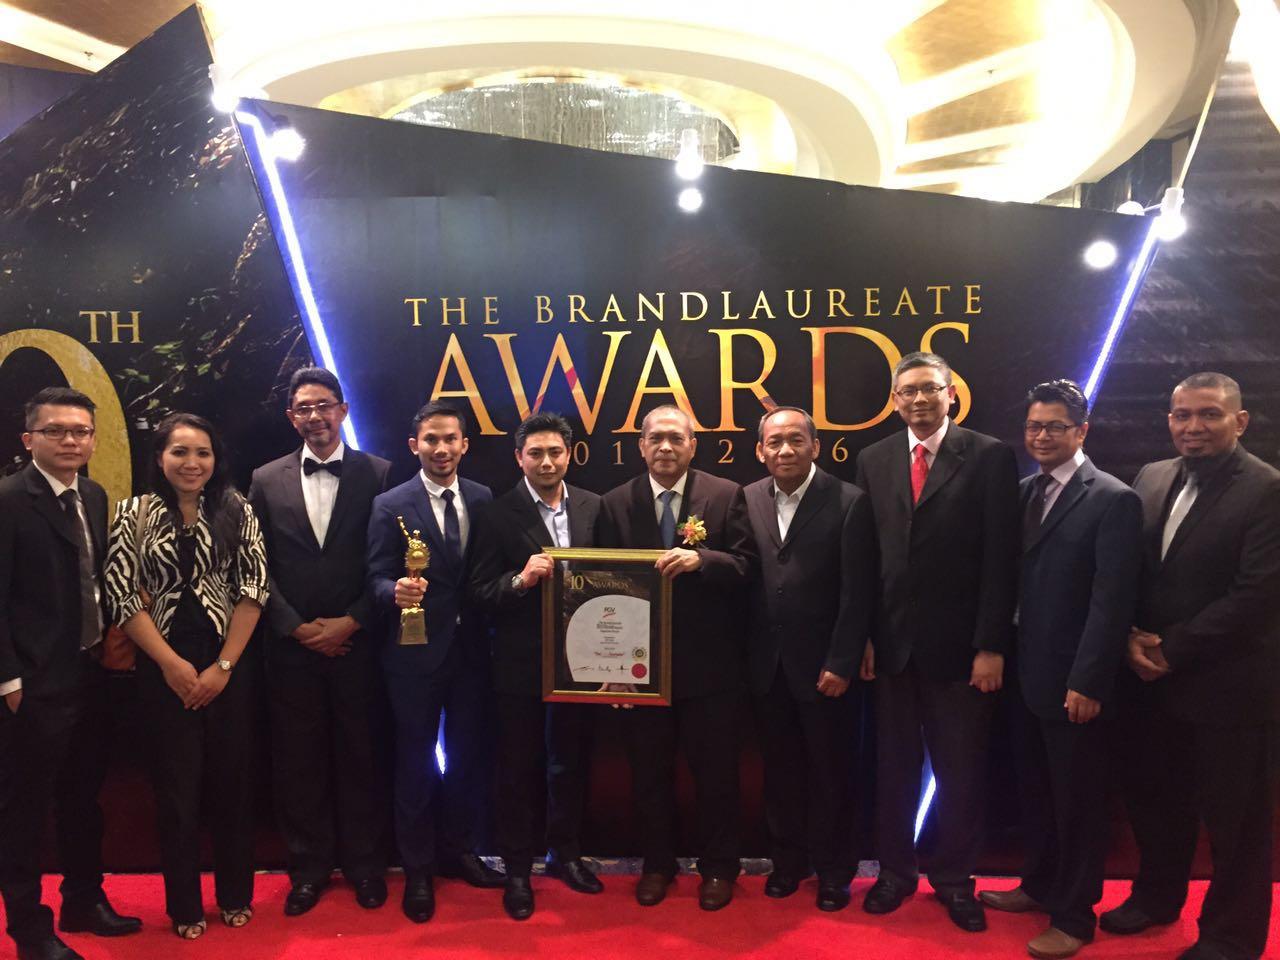 The Brand Laureate Award